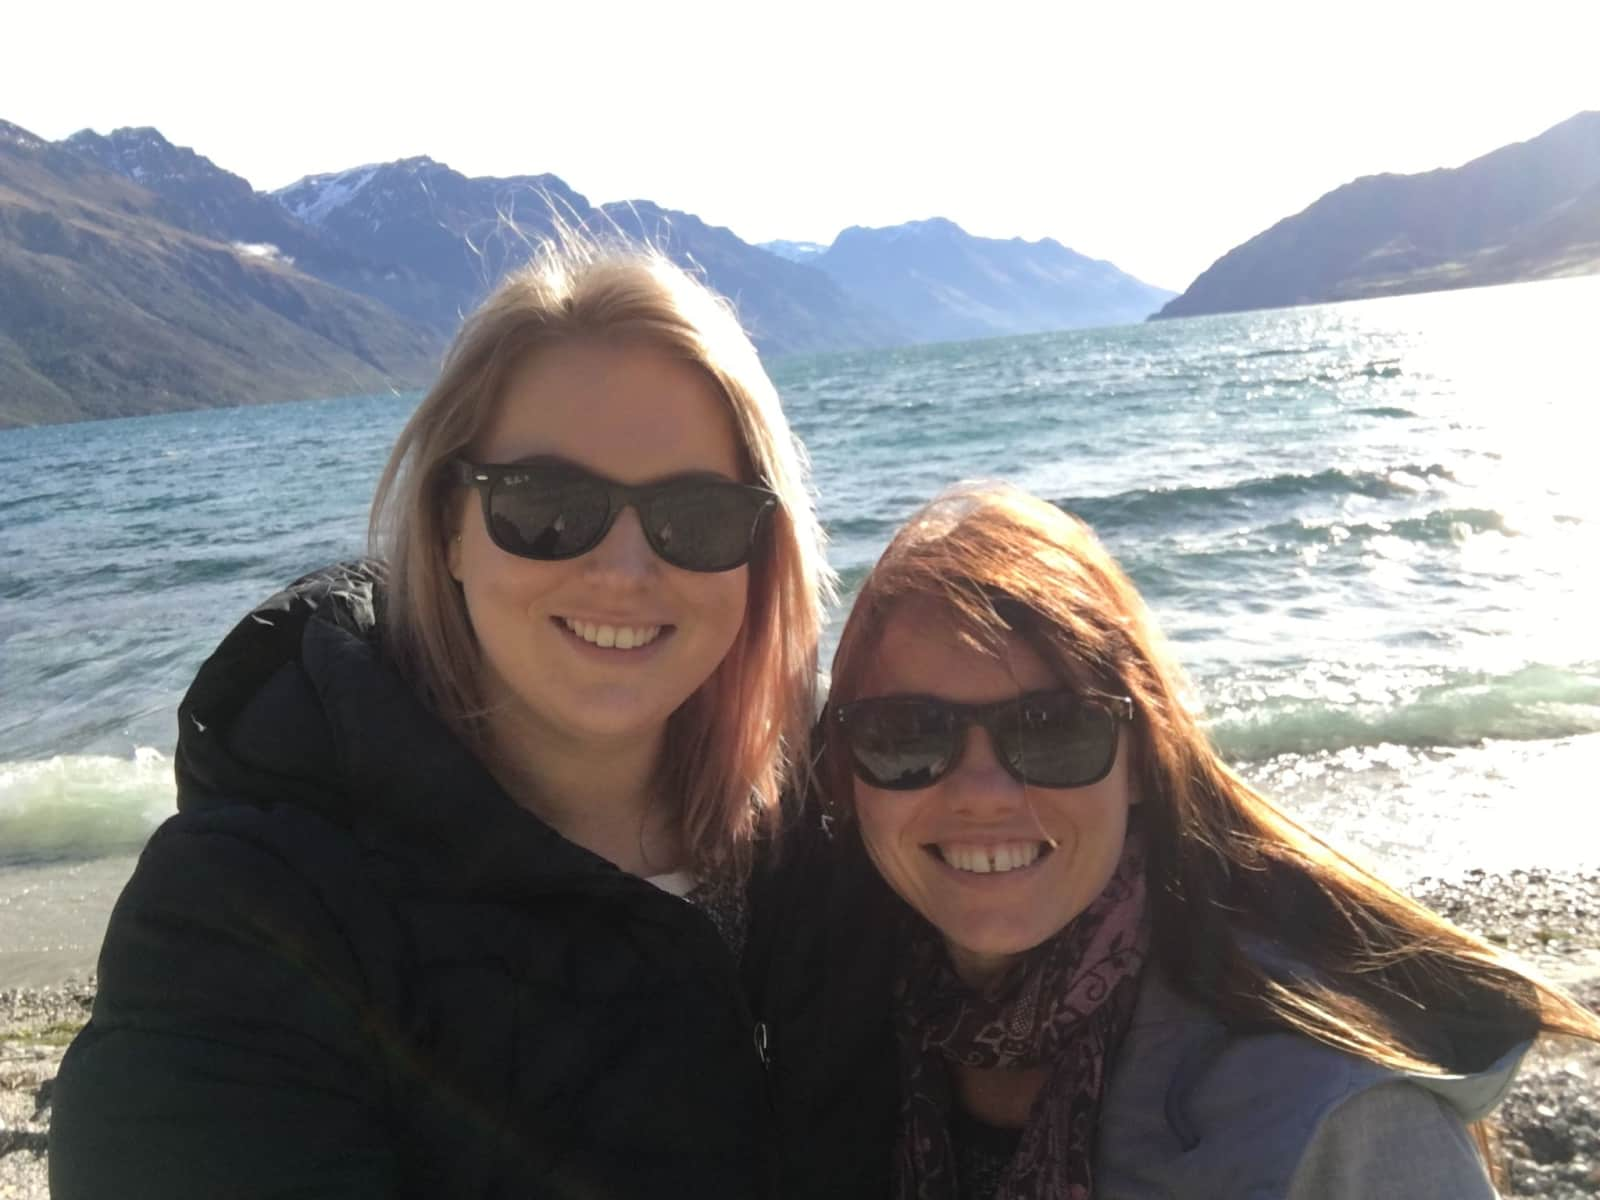 Sheehan & Morgann from Auckland, New Zealand